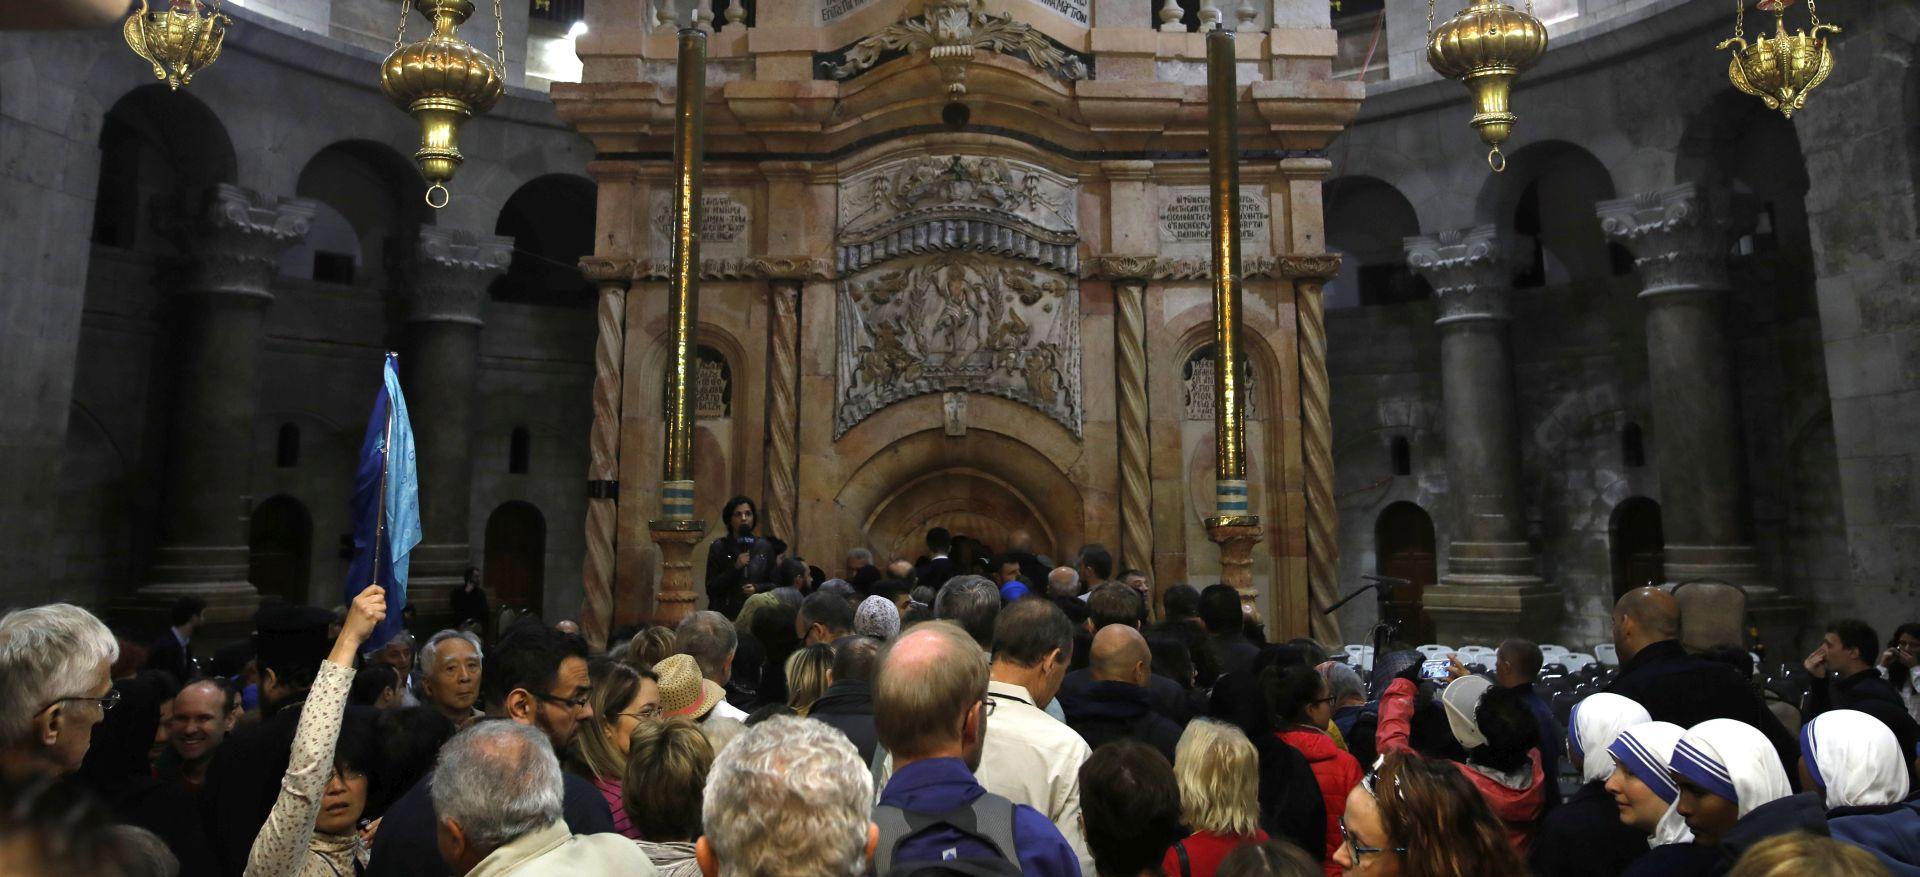 Biskupi srednjoistočne europe pozvali na suradnju po pitanju migrantske krize